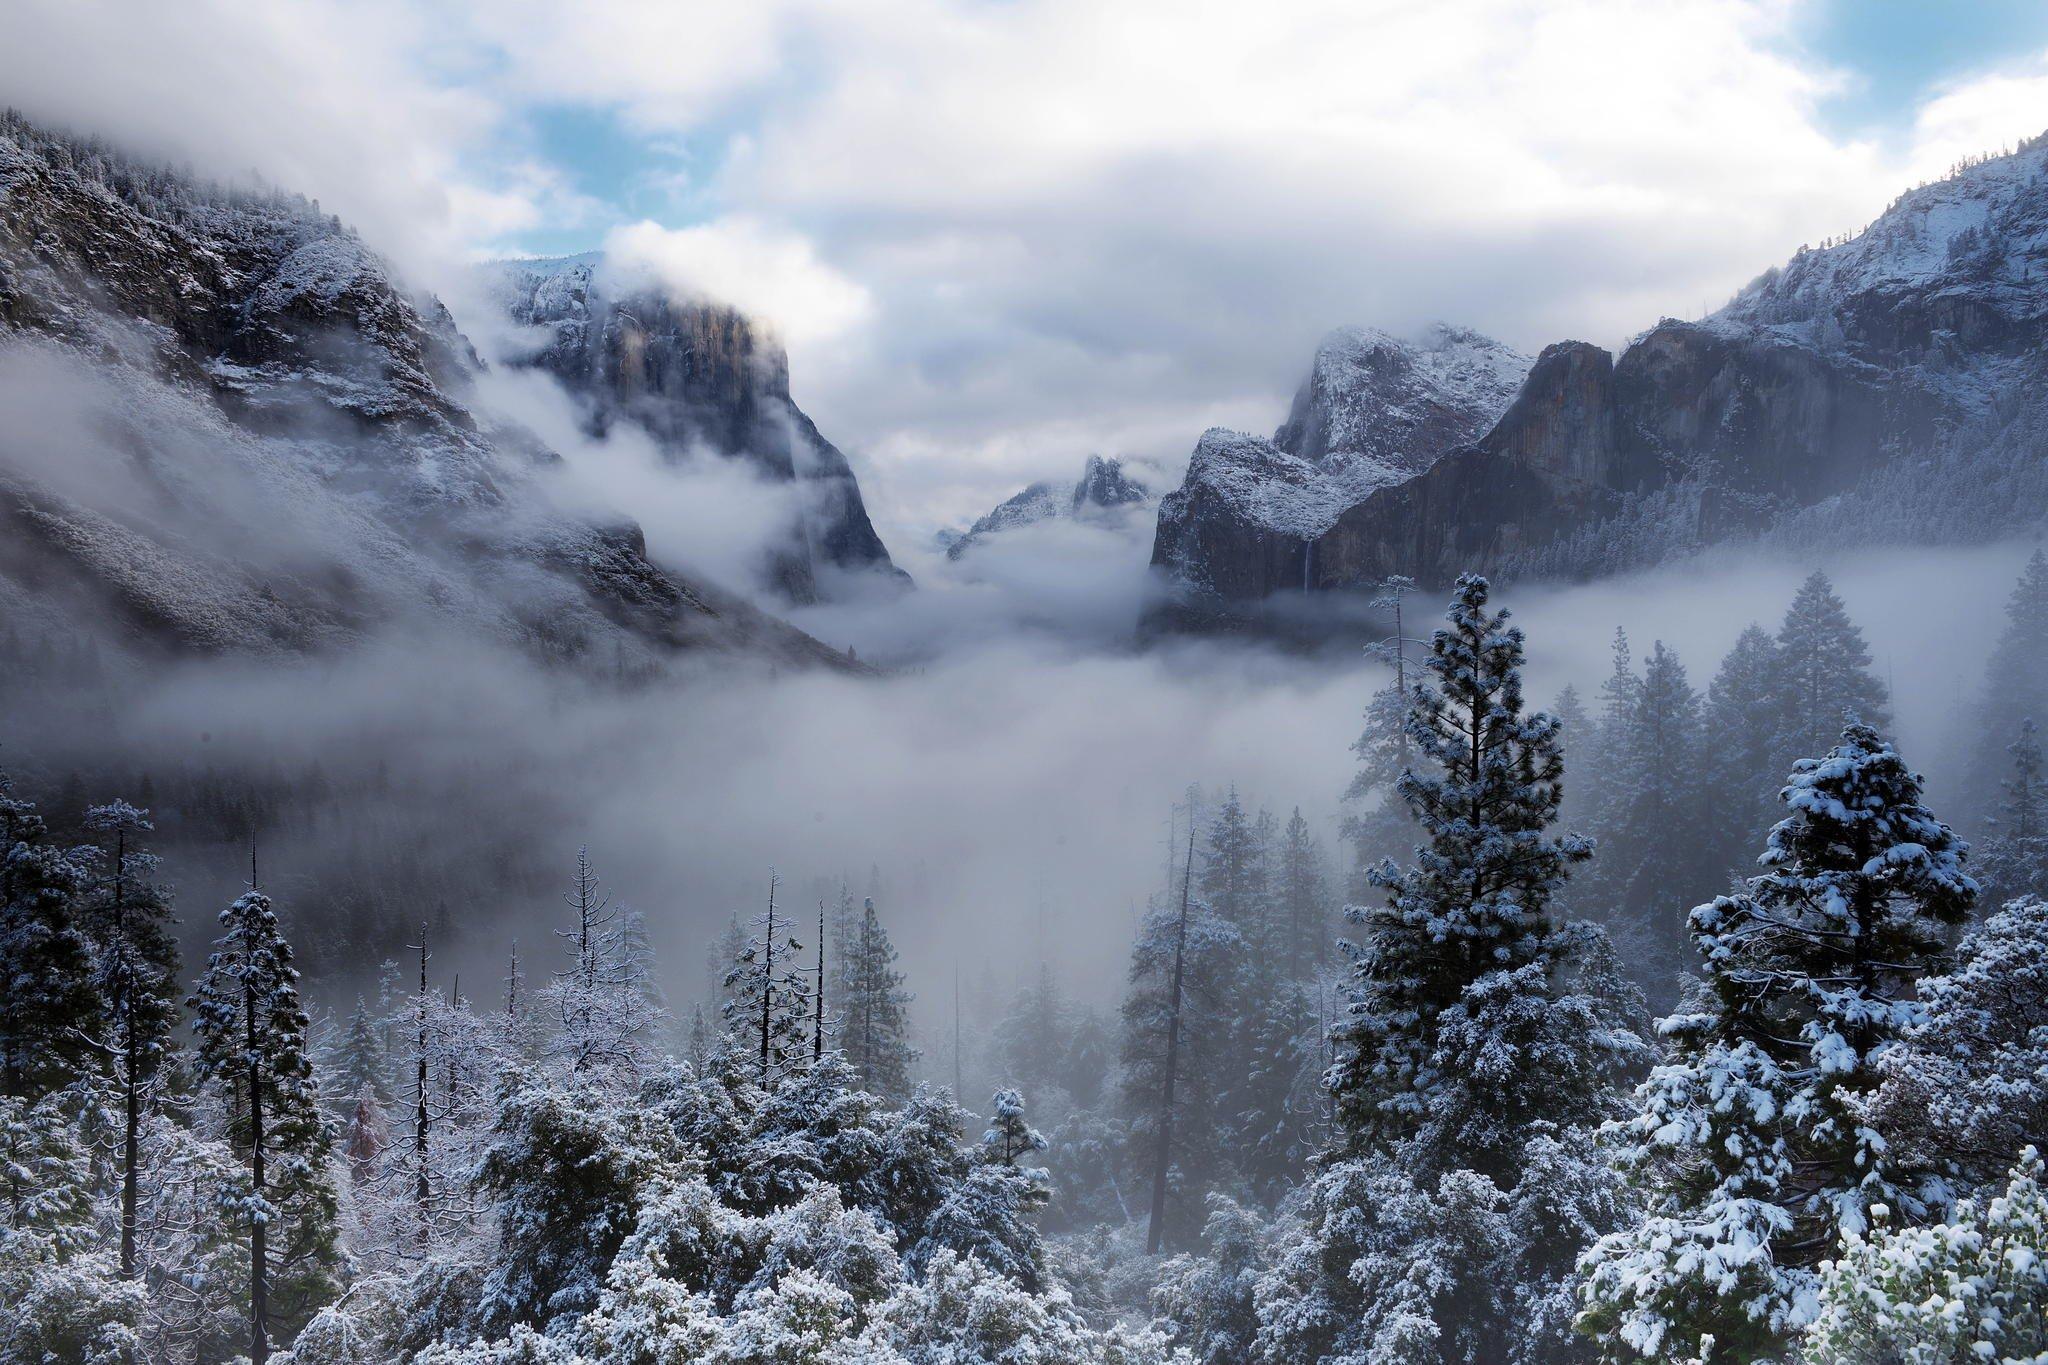 yosemite national park usa california winter snow forest. Black Bedroom Furniture Sets. Home Design Ideas